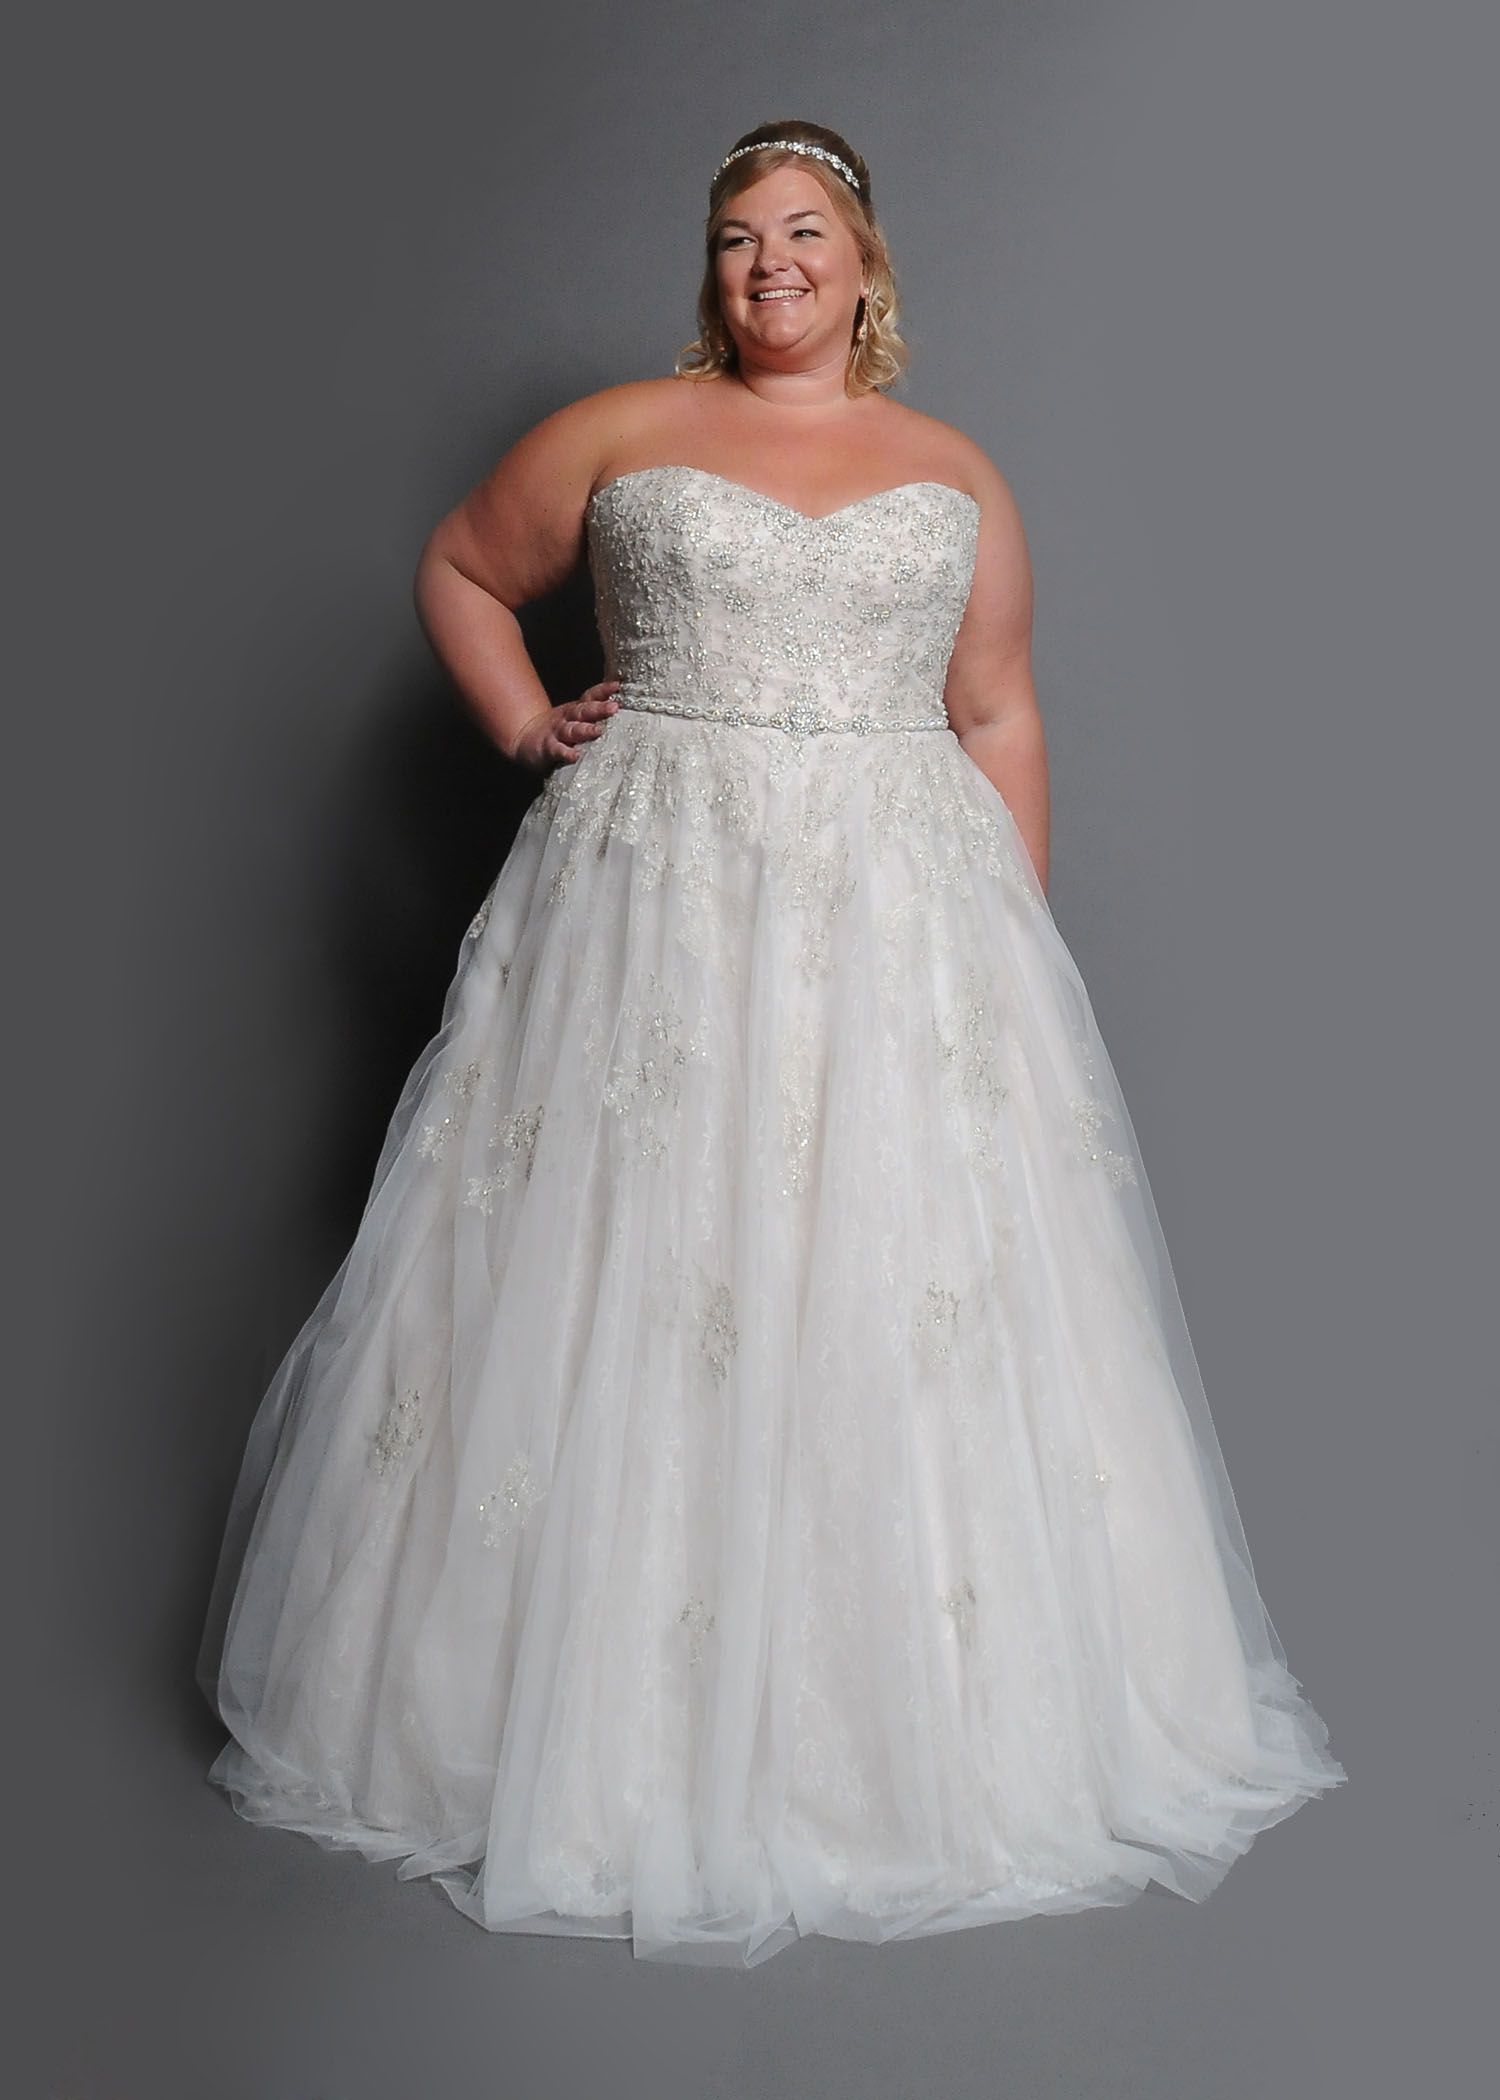 Curvy Bride, Plus size wedding gown, Essence of Australia | WEDDING ...